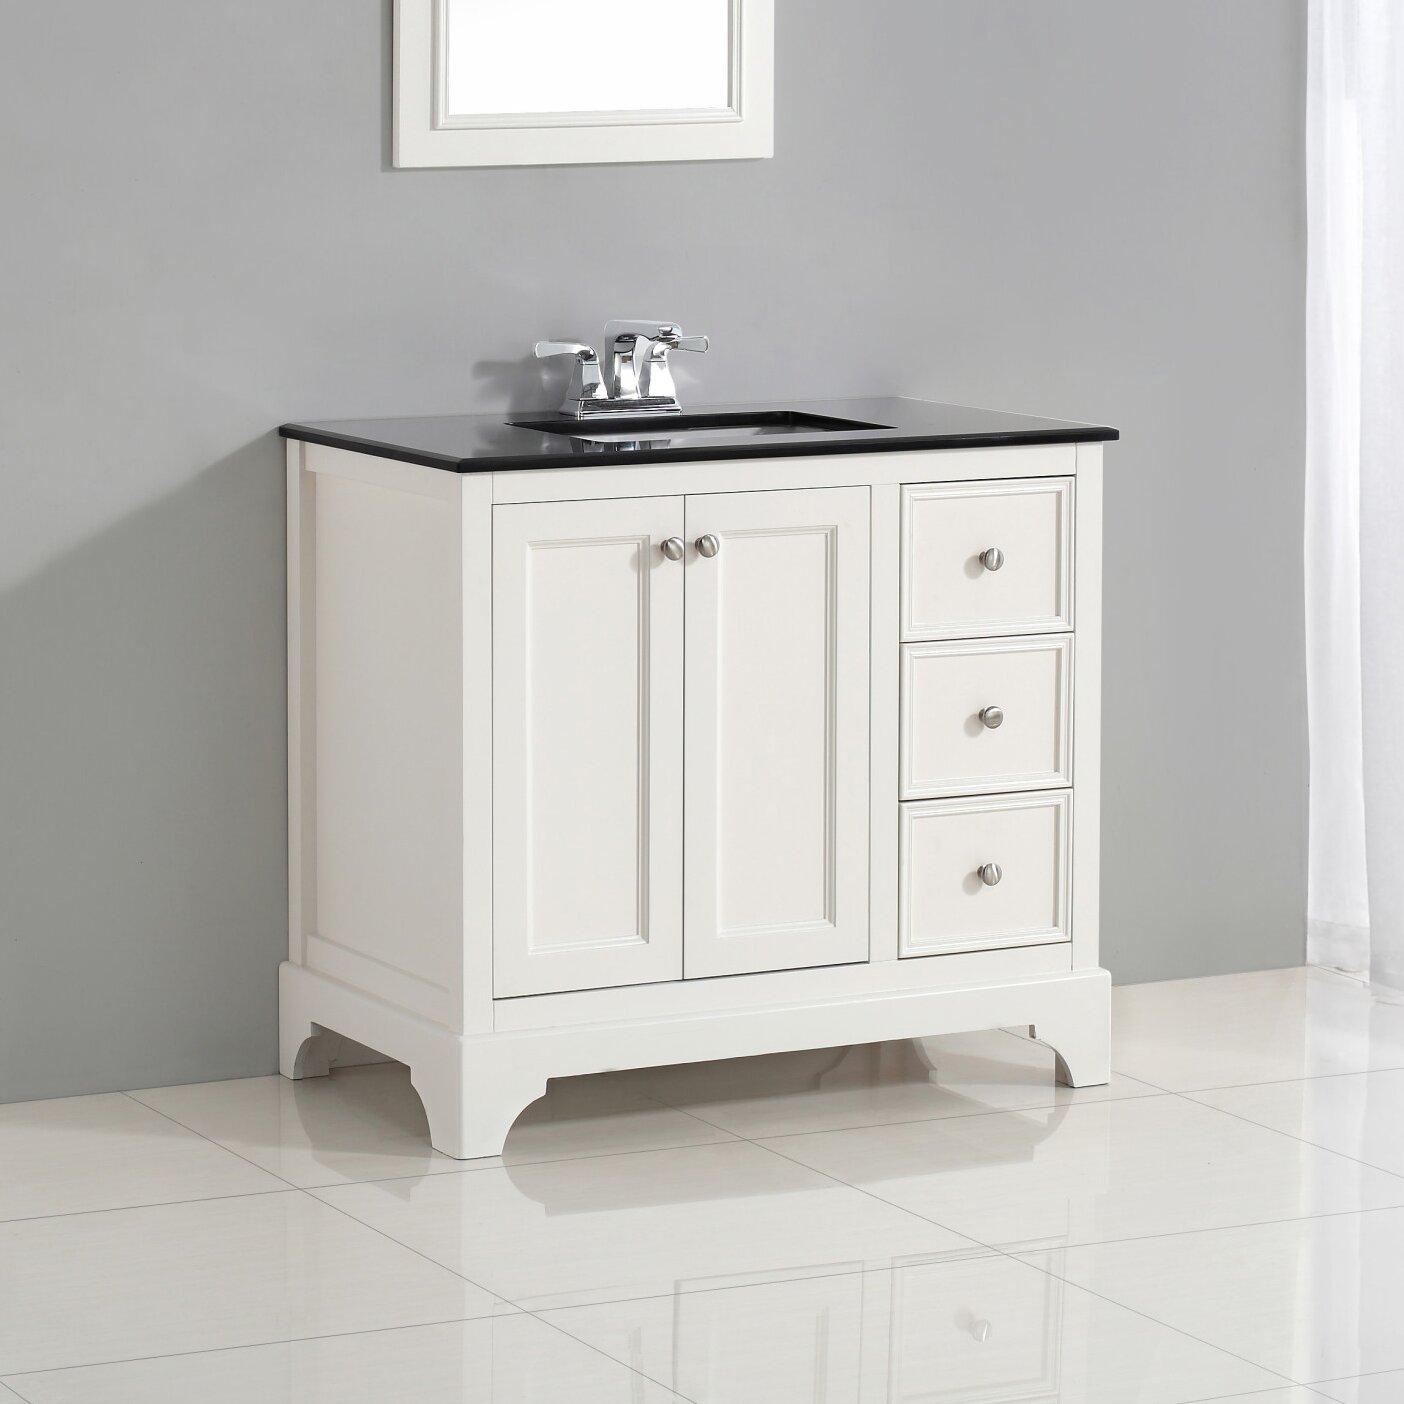 Simpli home cambridge 37 single bath vanity set reviews for Bath and vanity set